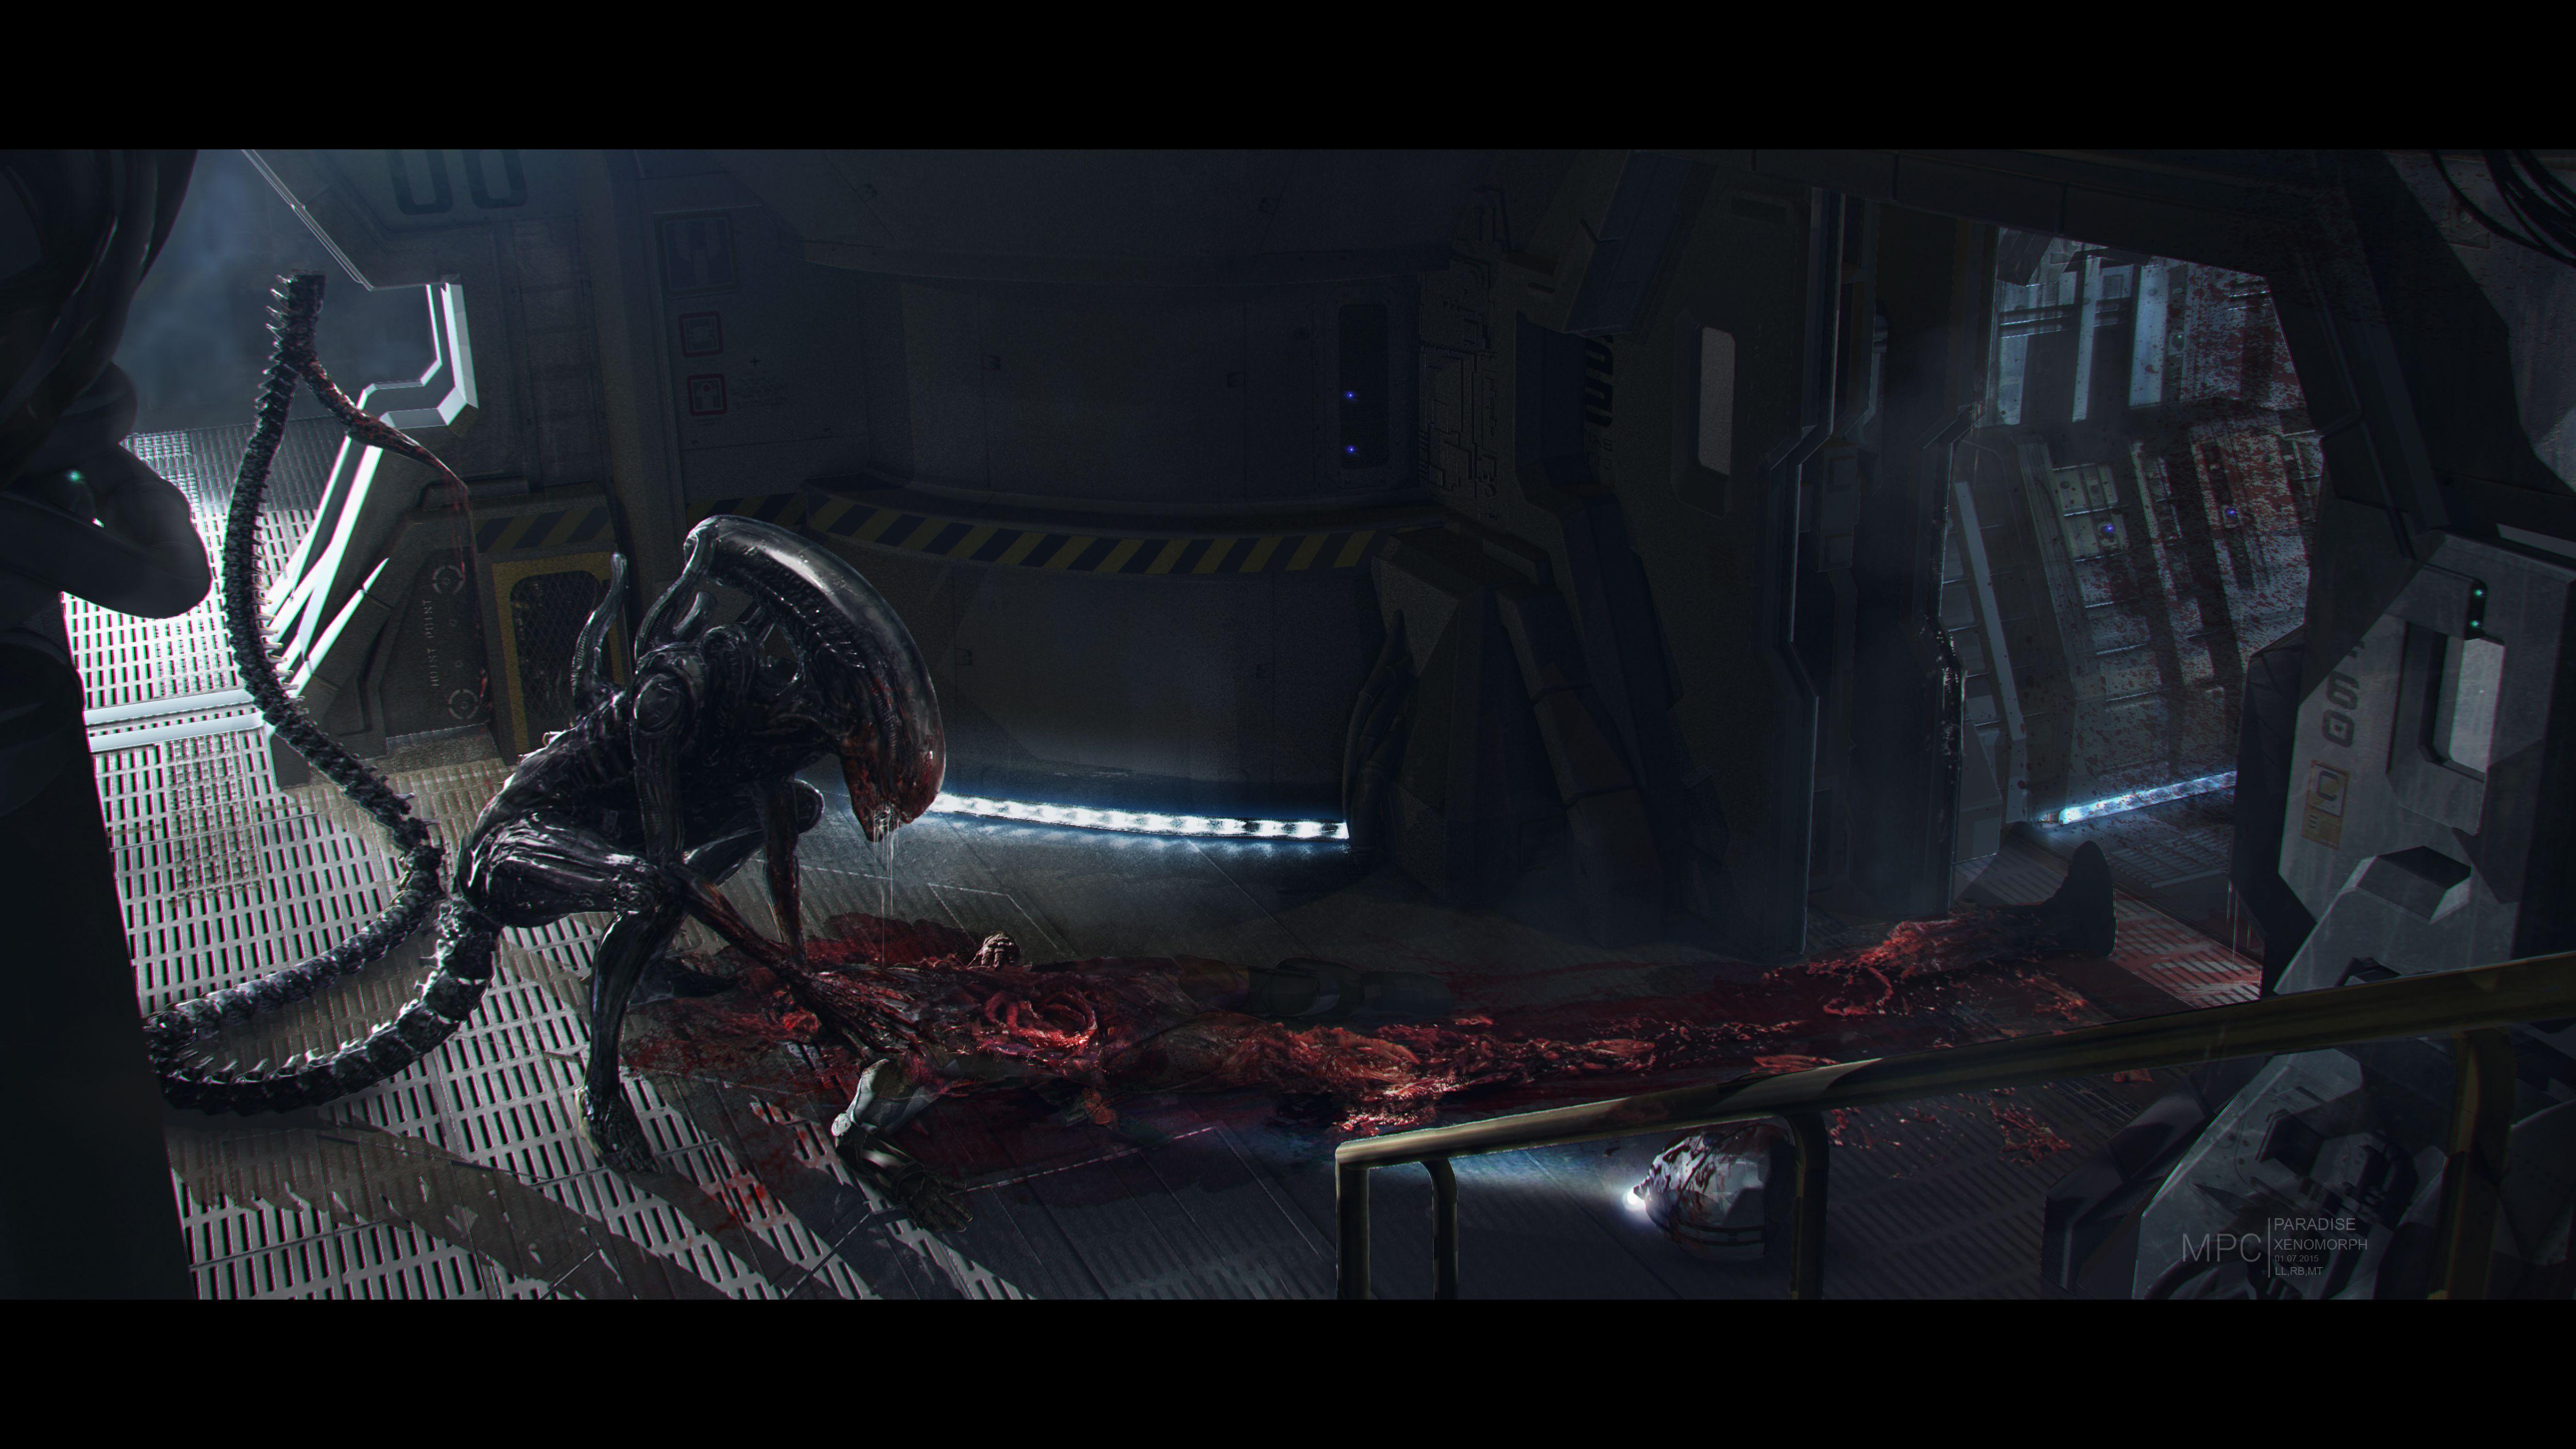 Dane Hallett Amp Matt Hatton Share Incredible Alien